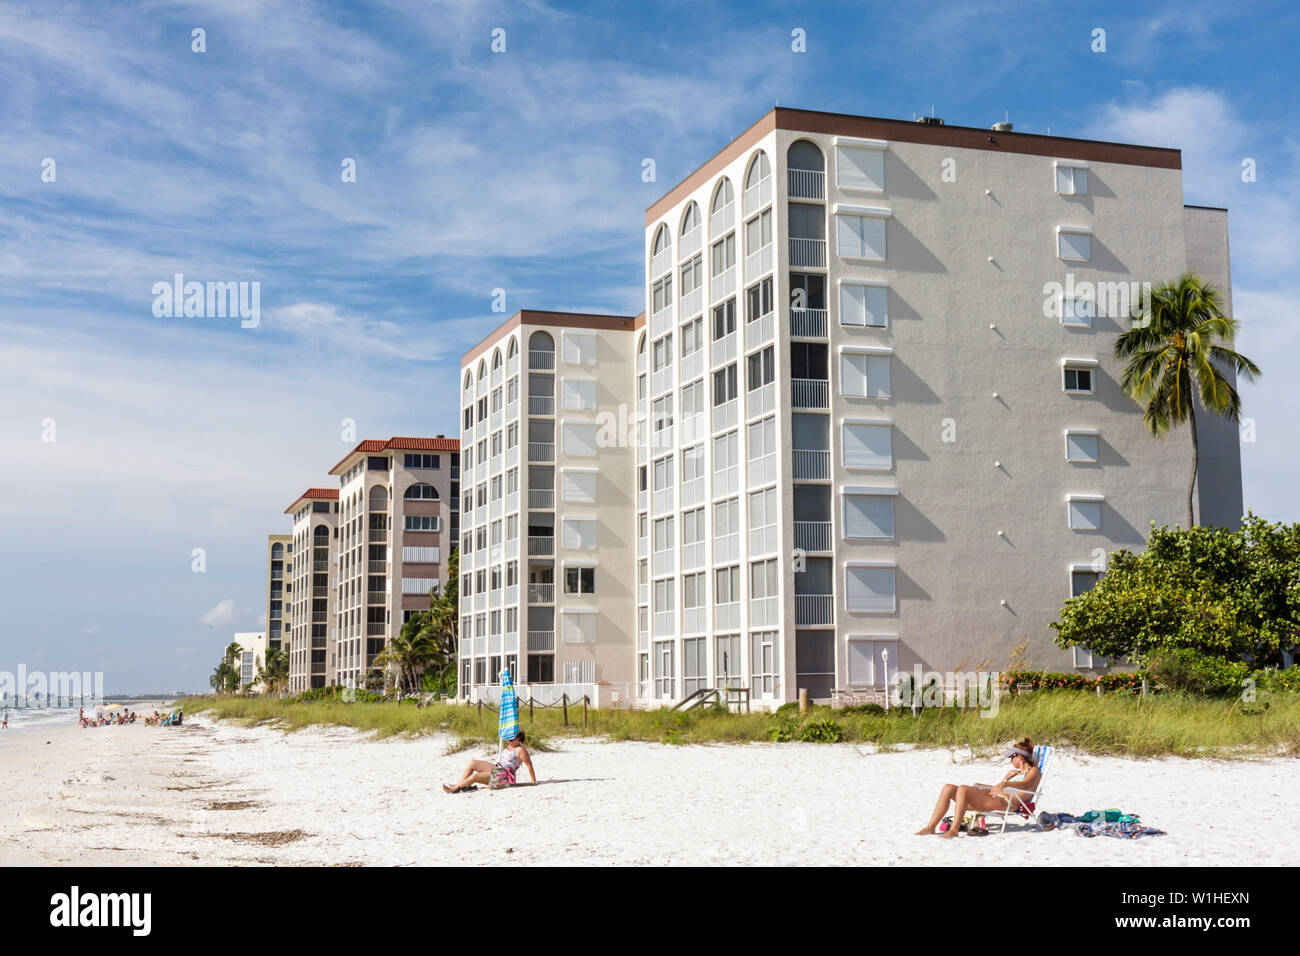 Florida Bonita Springs Gulf of Mexico public beach Little Hickory Beach oceanfront condominium building prime real estate woman - Stock Image